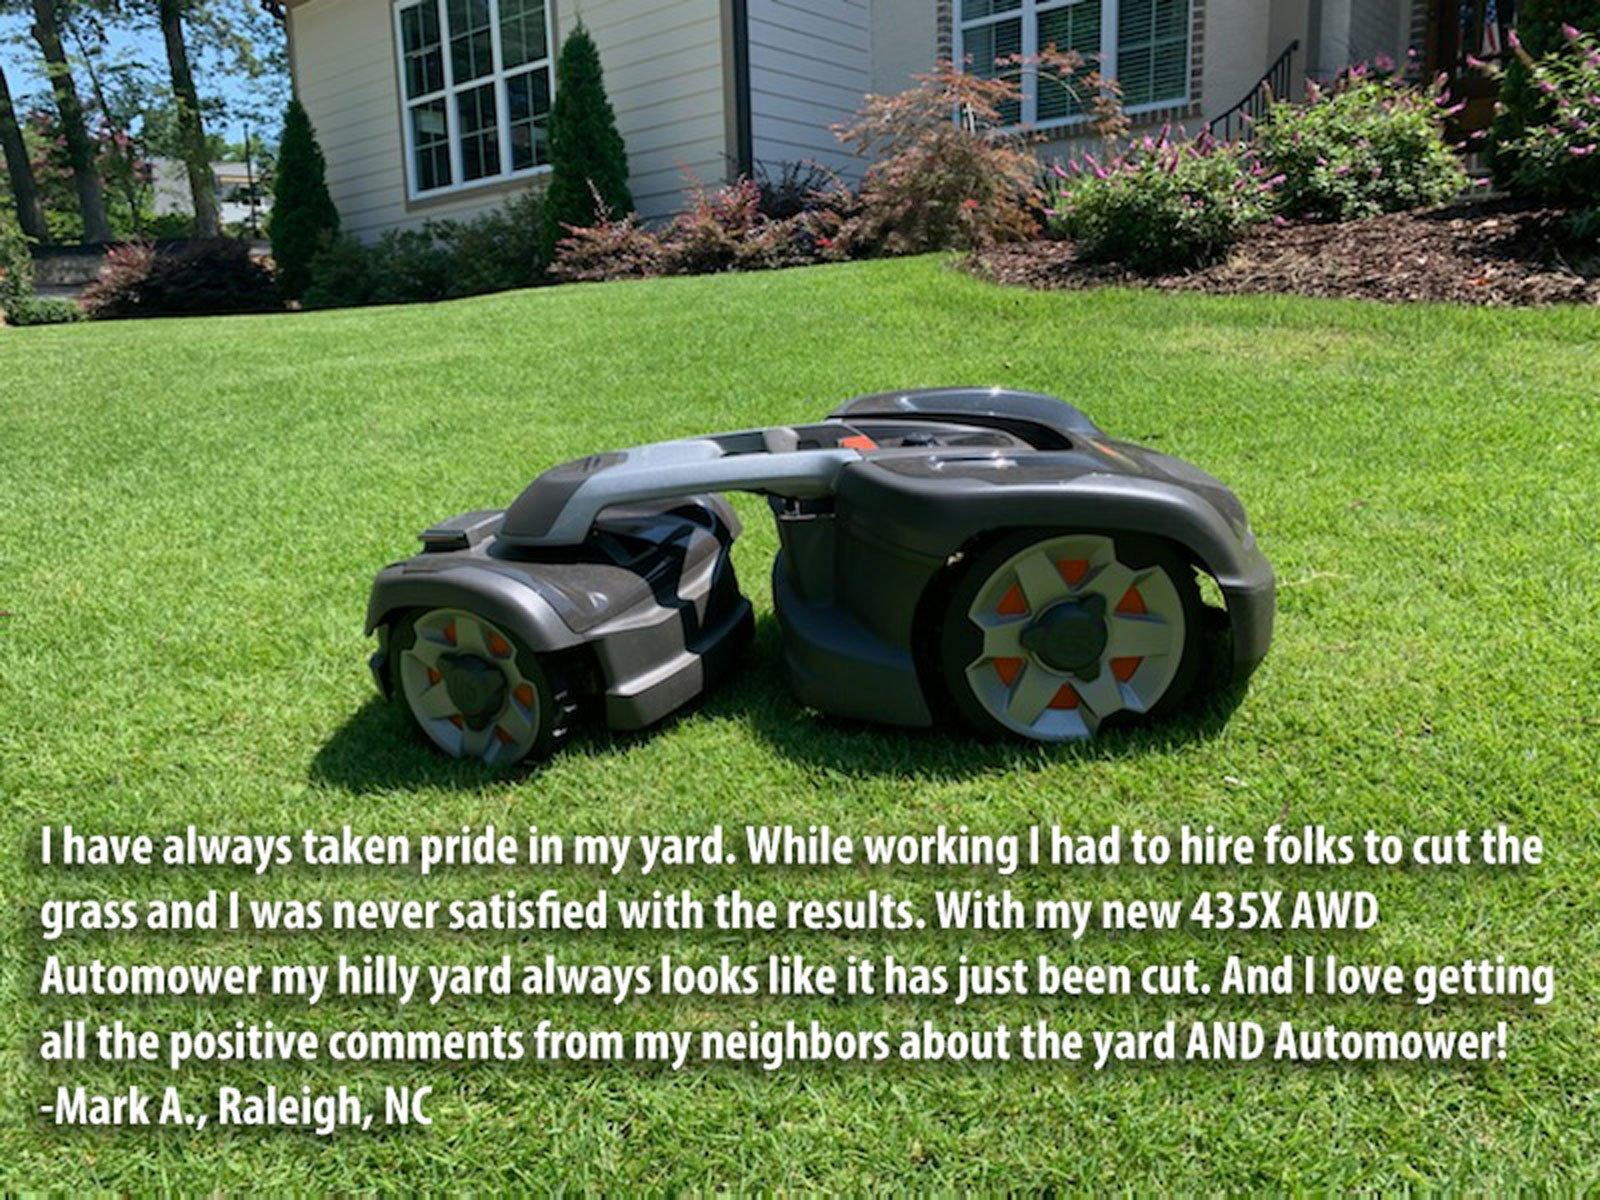 Automower_Testimonial